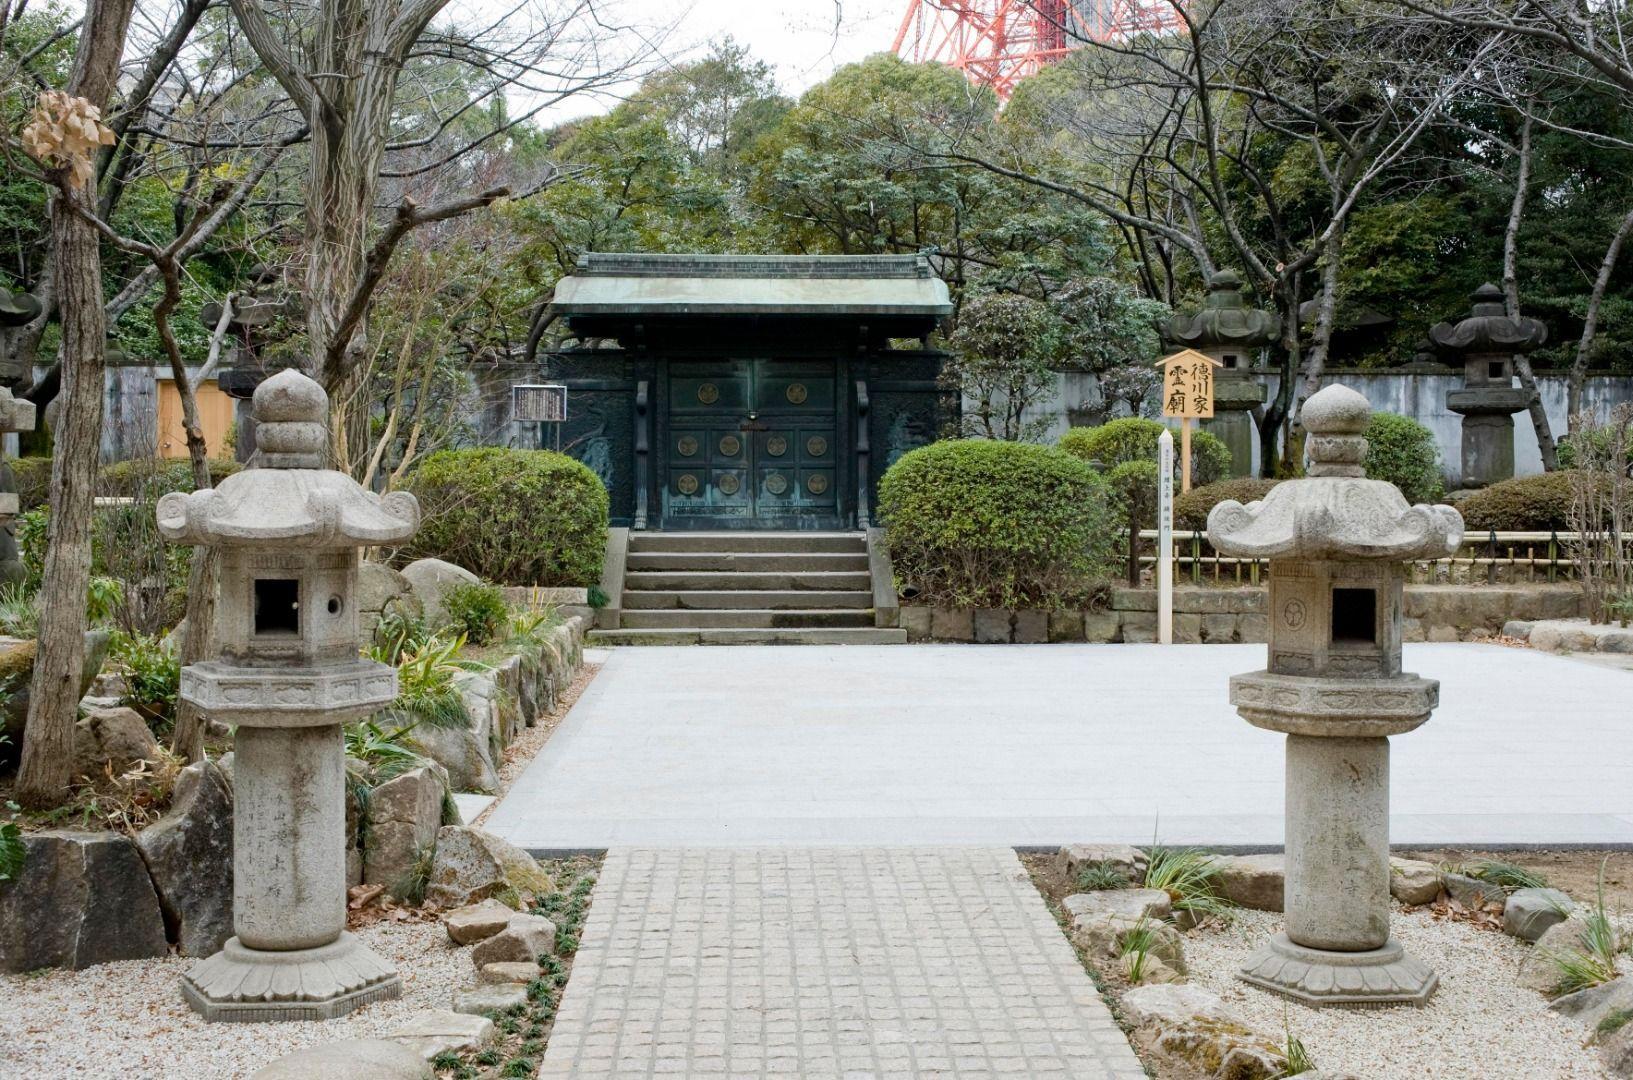 Japan Tokyo Daimon Zojo-ji NewYear